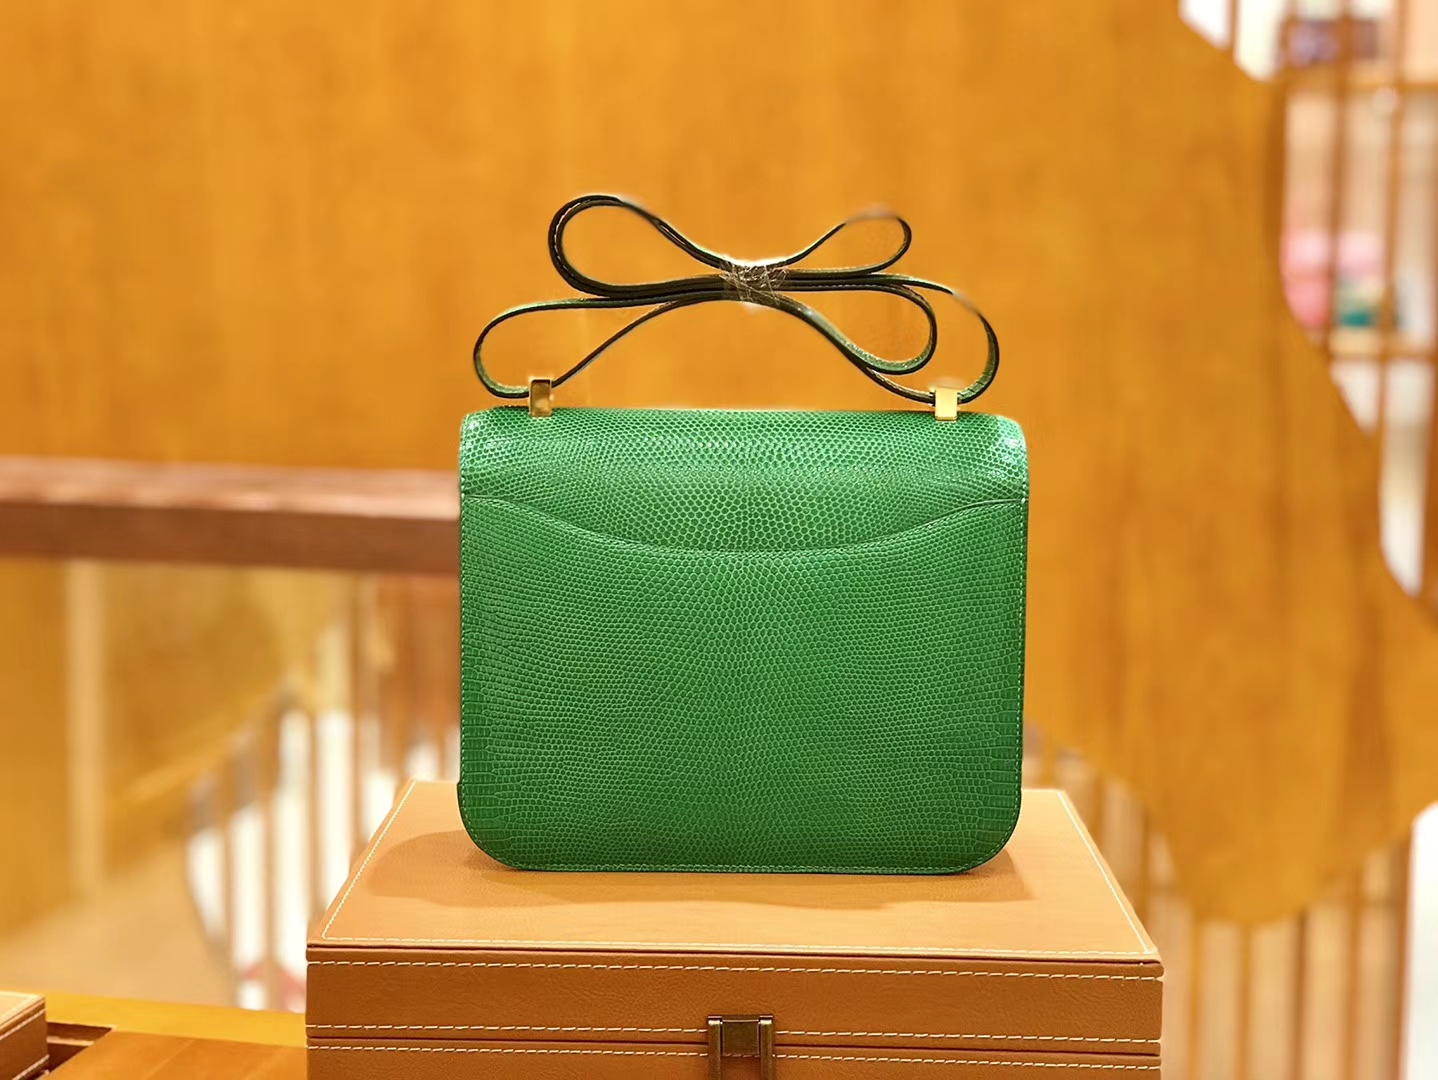 Hermès(爱马仕)Constance 18cm 竹子绿 南非蜥蜴皮 全手工缝制